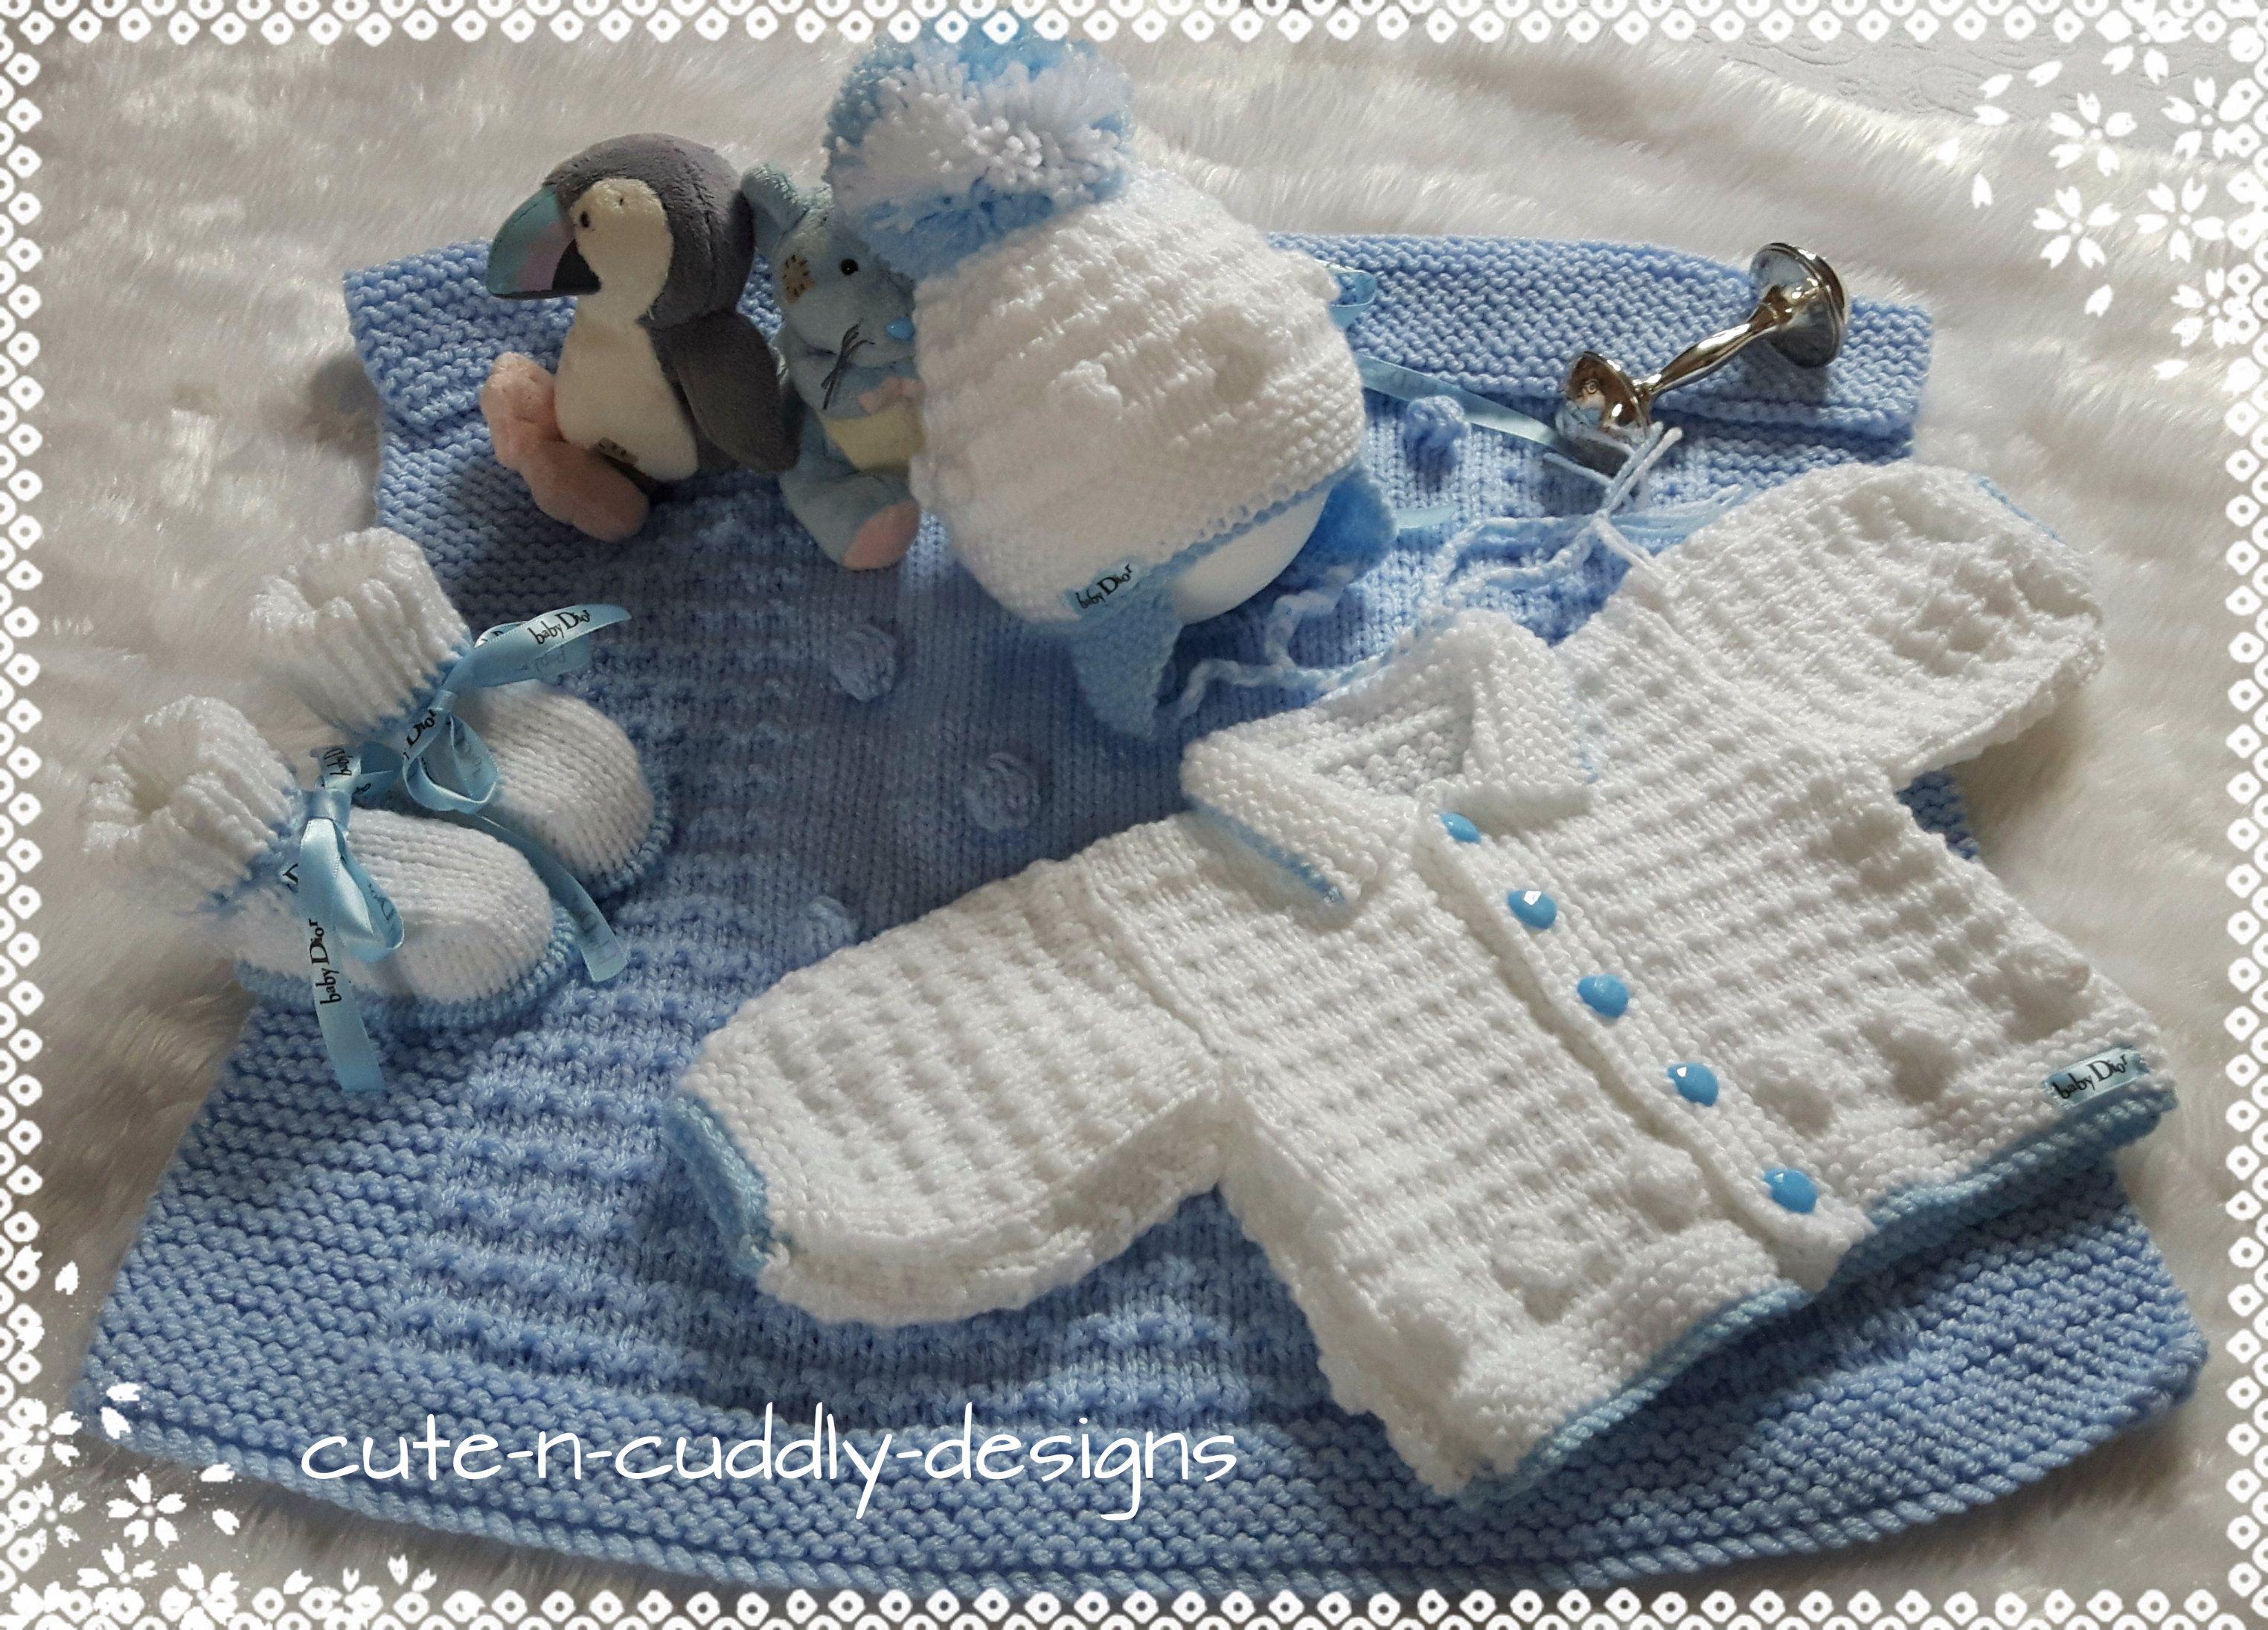 Pin de Cutencuddlydesigns Kps en My Own Designer Knitting Patterns ...